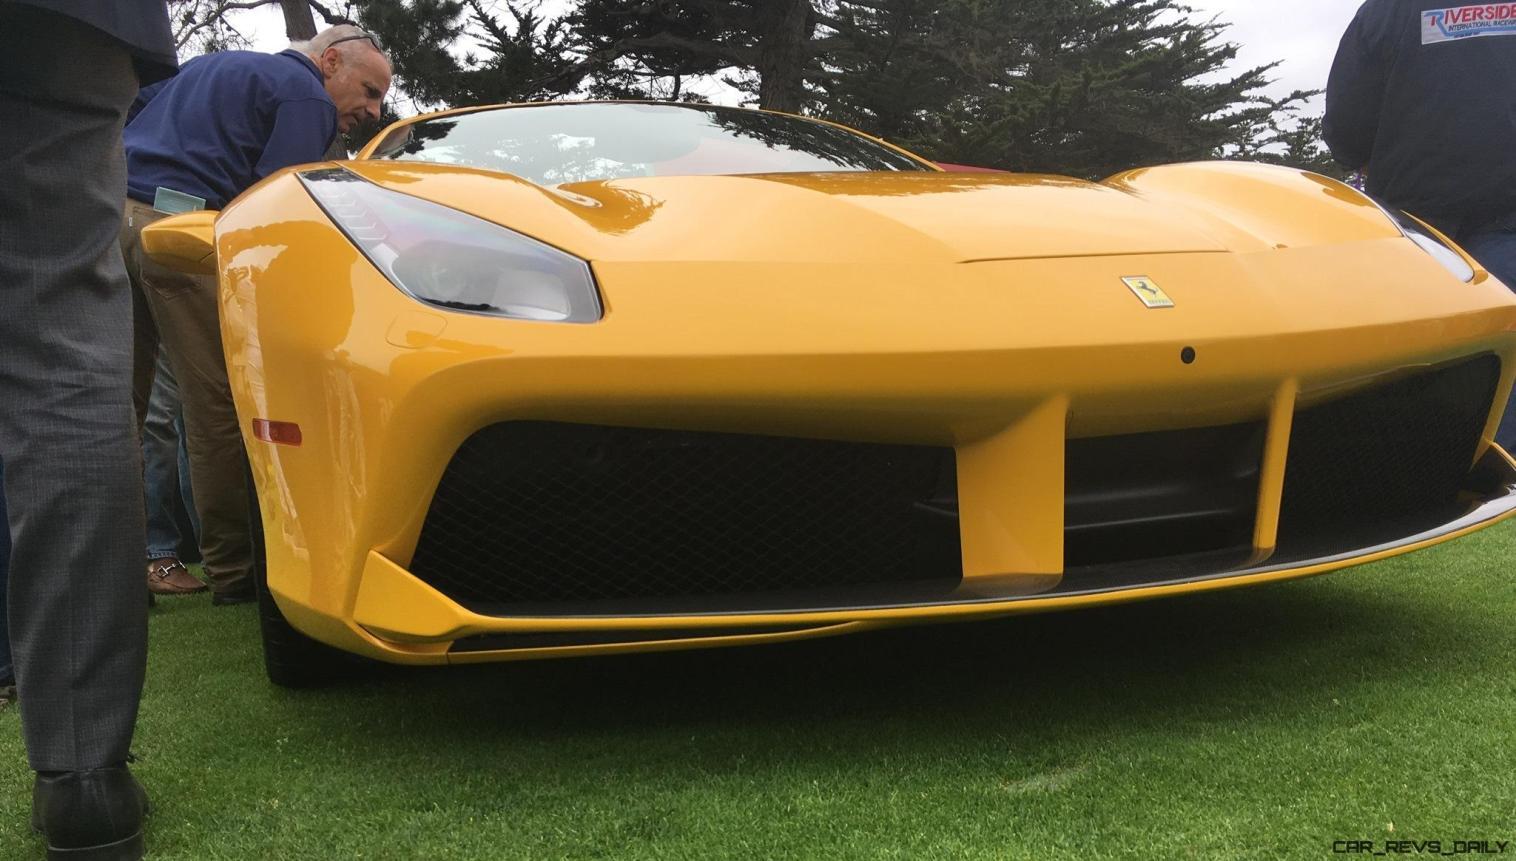 2017 Ferrari 70 Anni Collection at Pebble Beach Concours 13